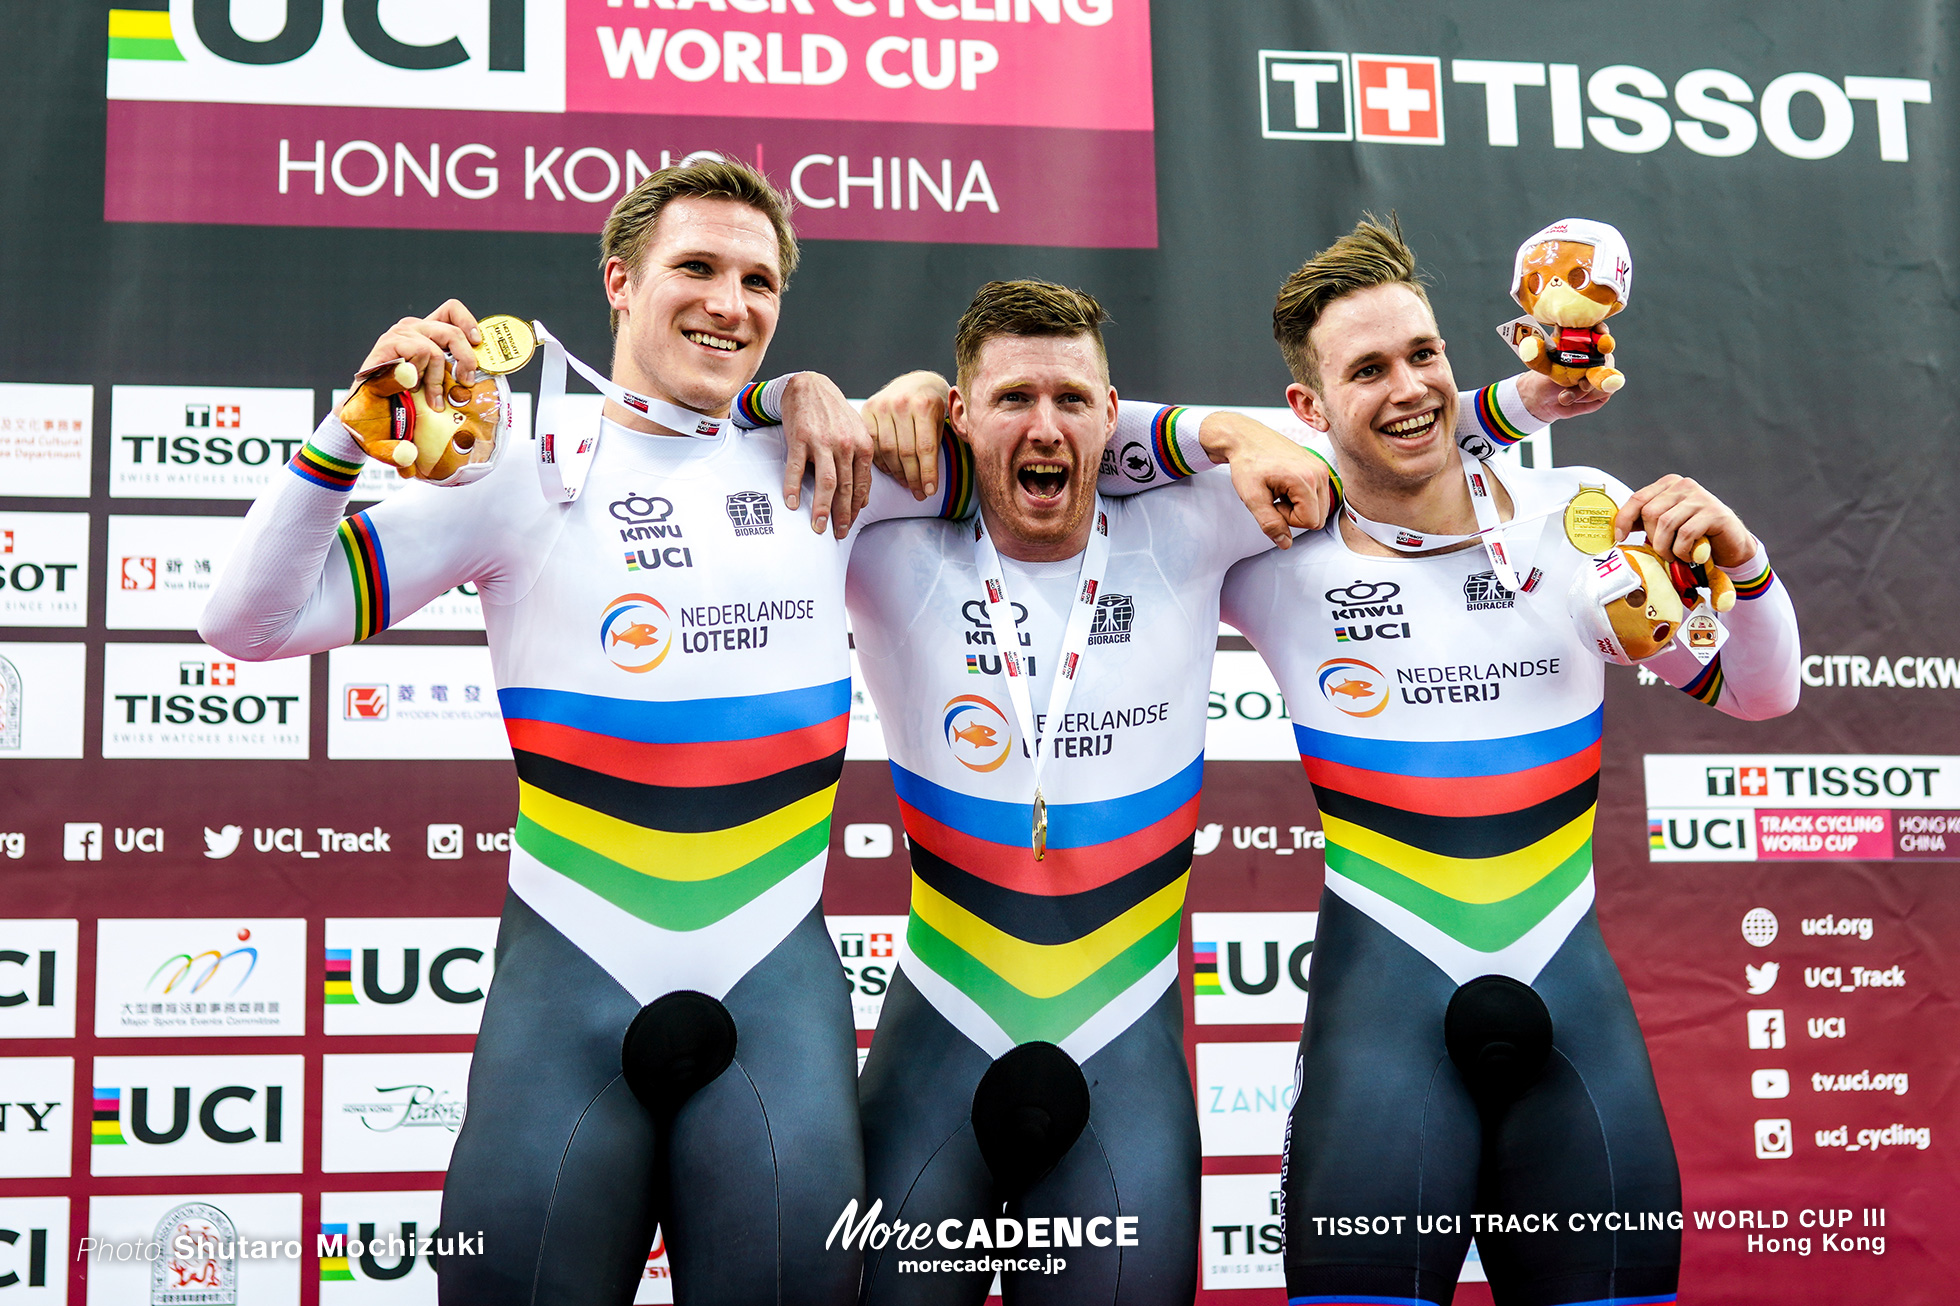 Final / Men's Team Sprint / TISSOT UCI TRACK CYCLING WORLD CUP III, Hong Kong, Jeffrey HOOGLAND ジェフリー・ホーフラント Harrie LAVREYSEN ハリー・ラブレイセン Roy van den BERG ロイ・バンデンバーグ